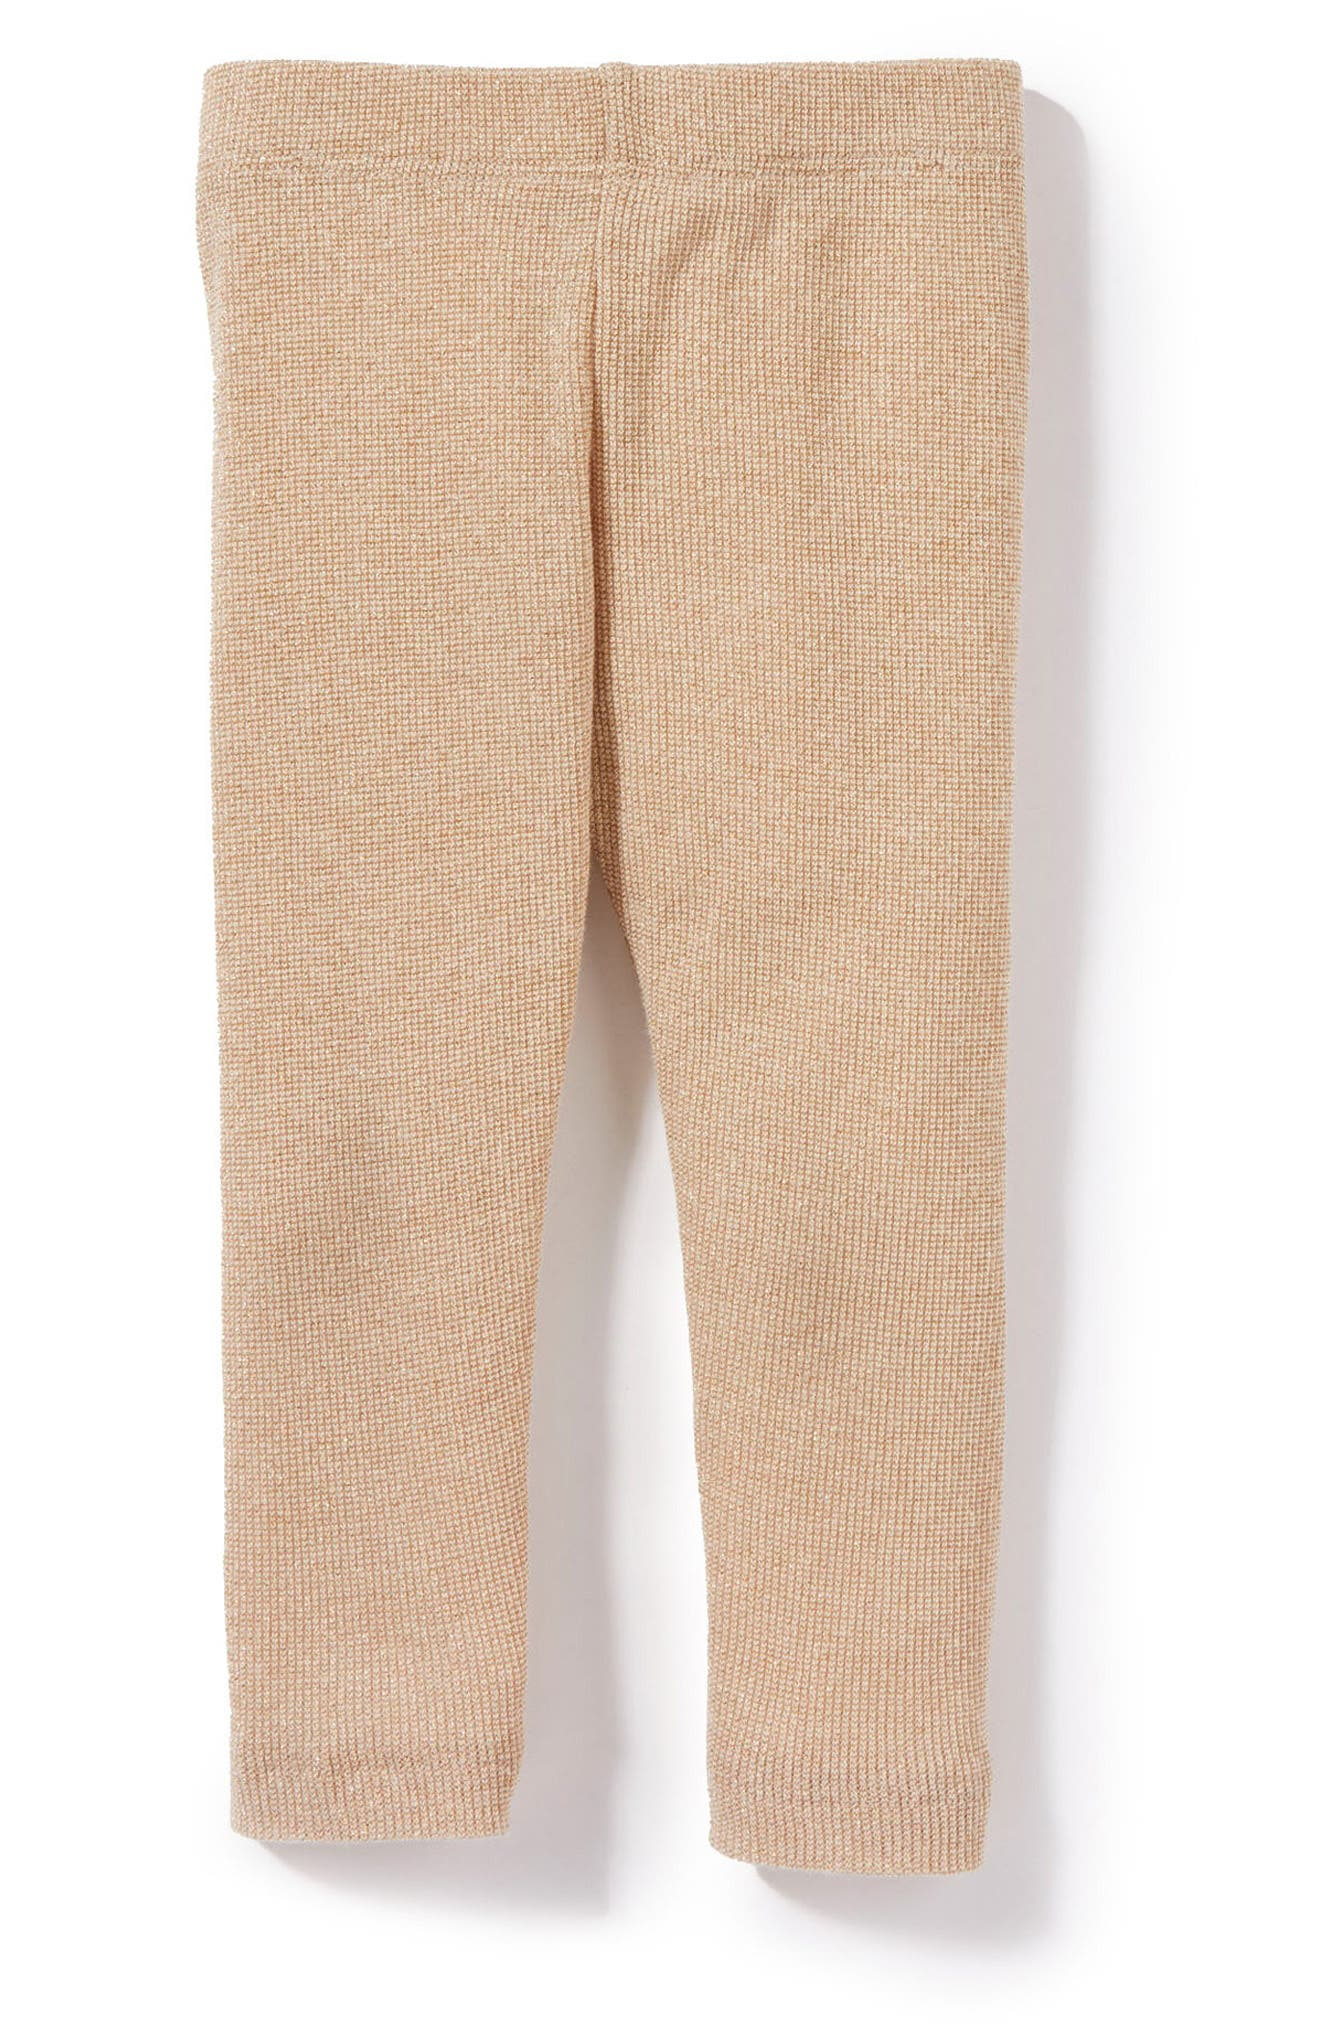 Lara Sparkle Leggings,                         Main,                         color, Gold